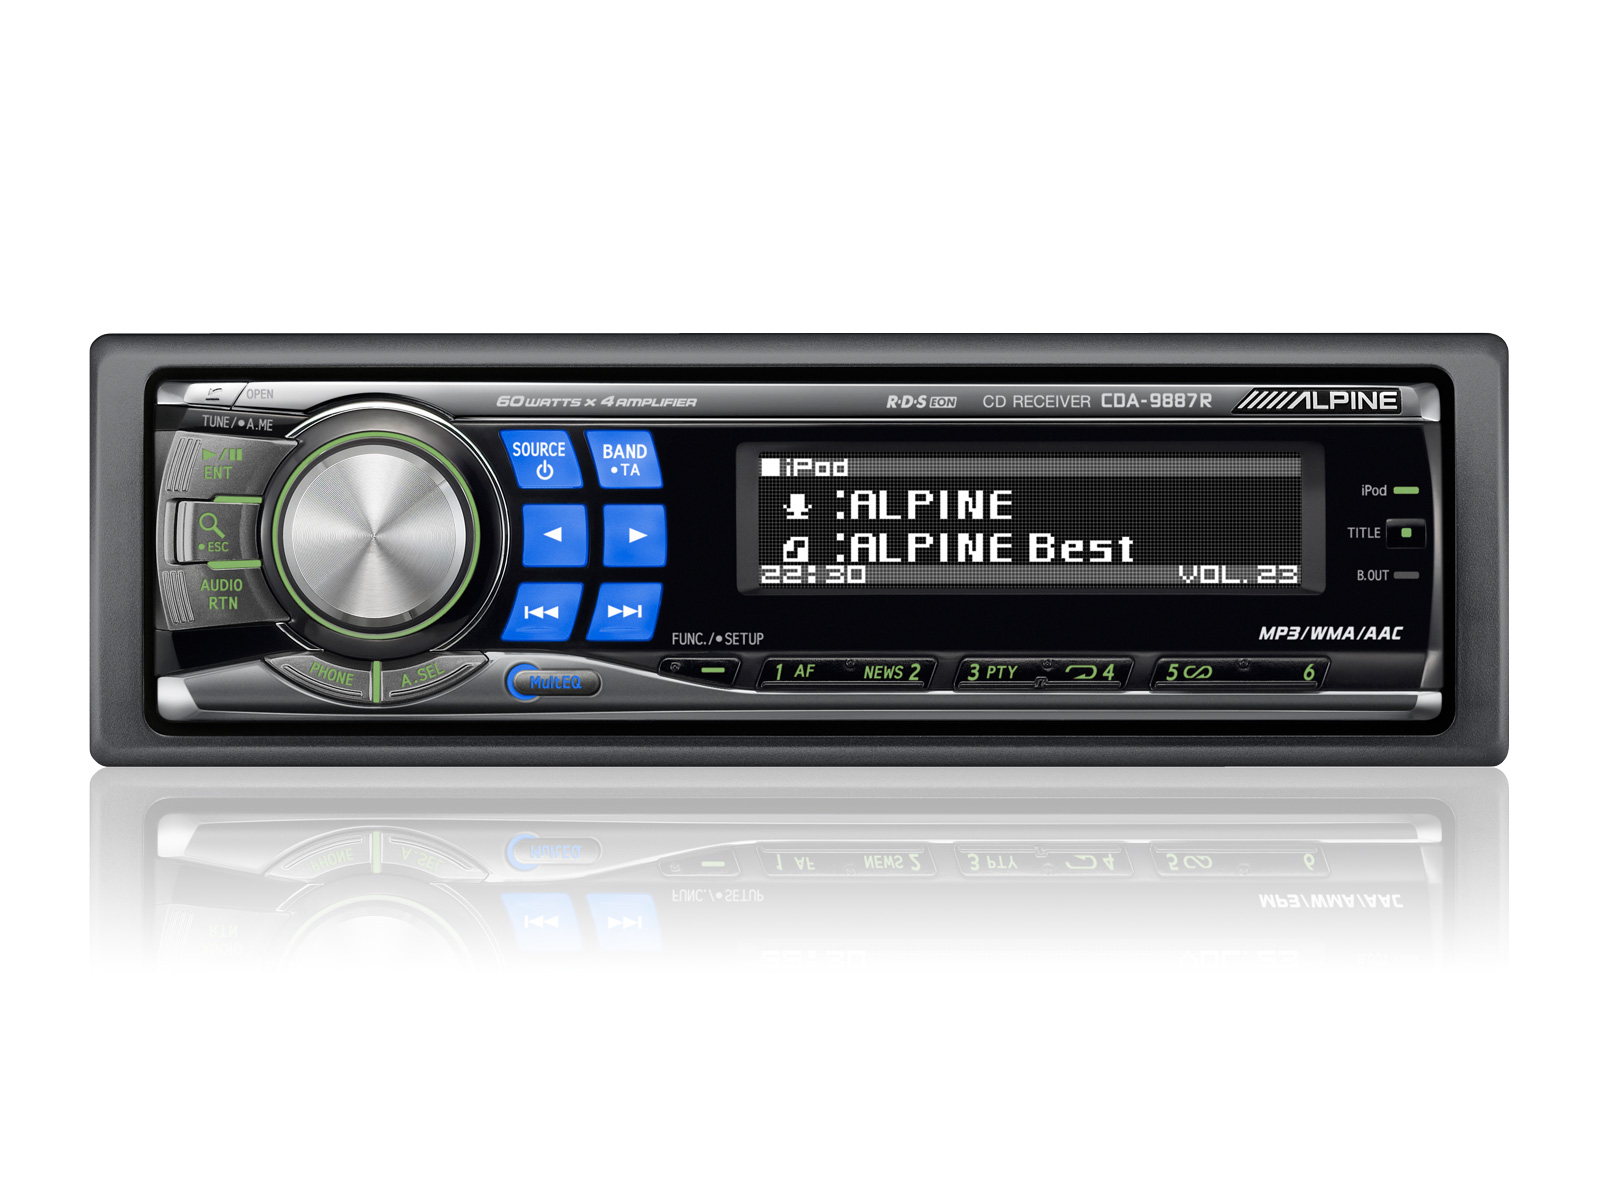 381868 A Pillars Morel Elate Limited Skoda Octavia together with Watch additionally Radio Jvc Kd G343 Mp3 Od Zlocisza 4547484 in addition 202533 Nissan almera 1 8 sport additionally 504779. on cda 9887r